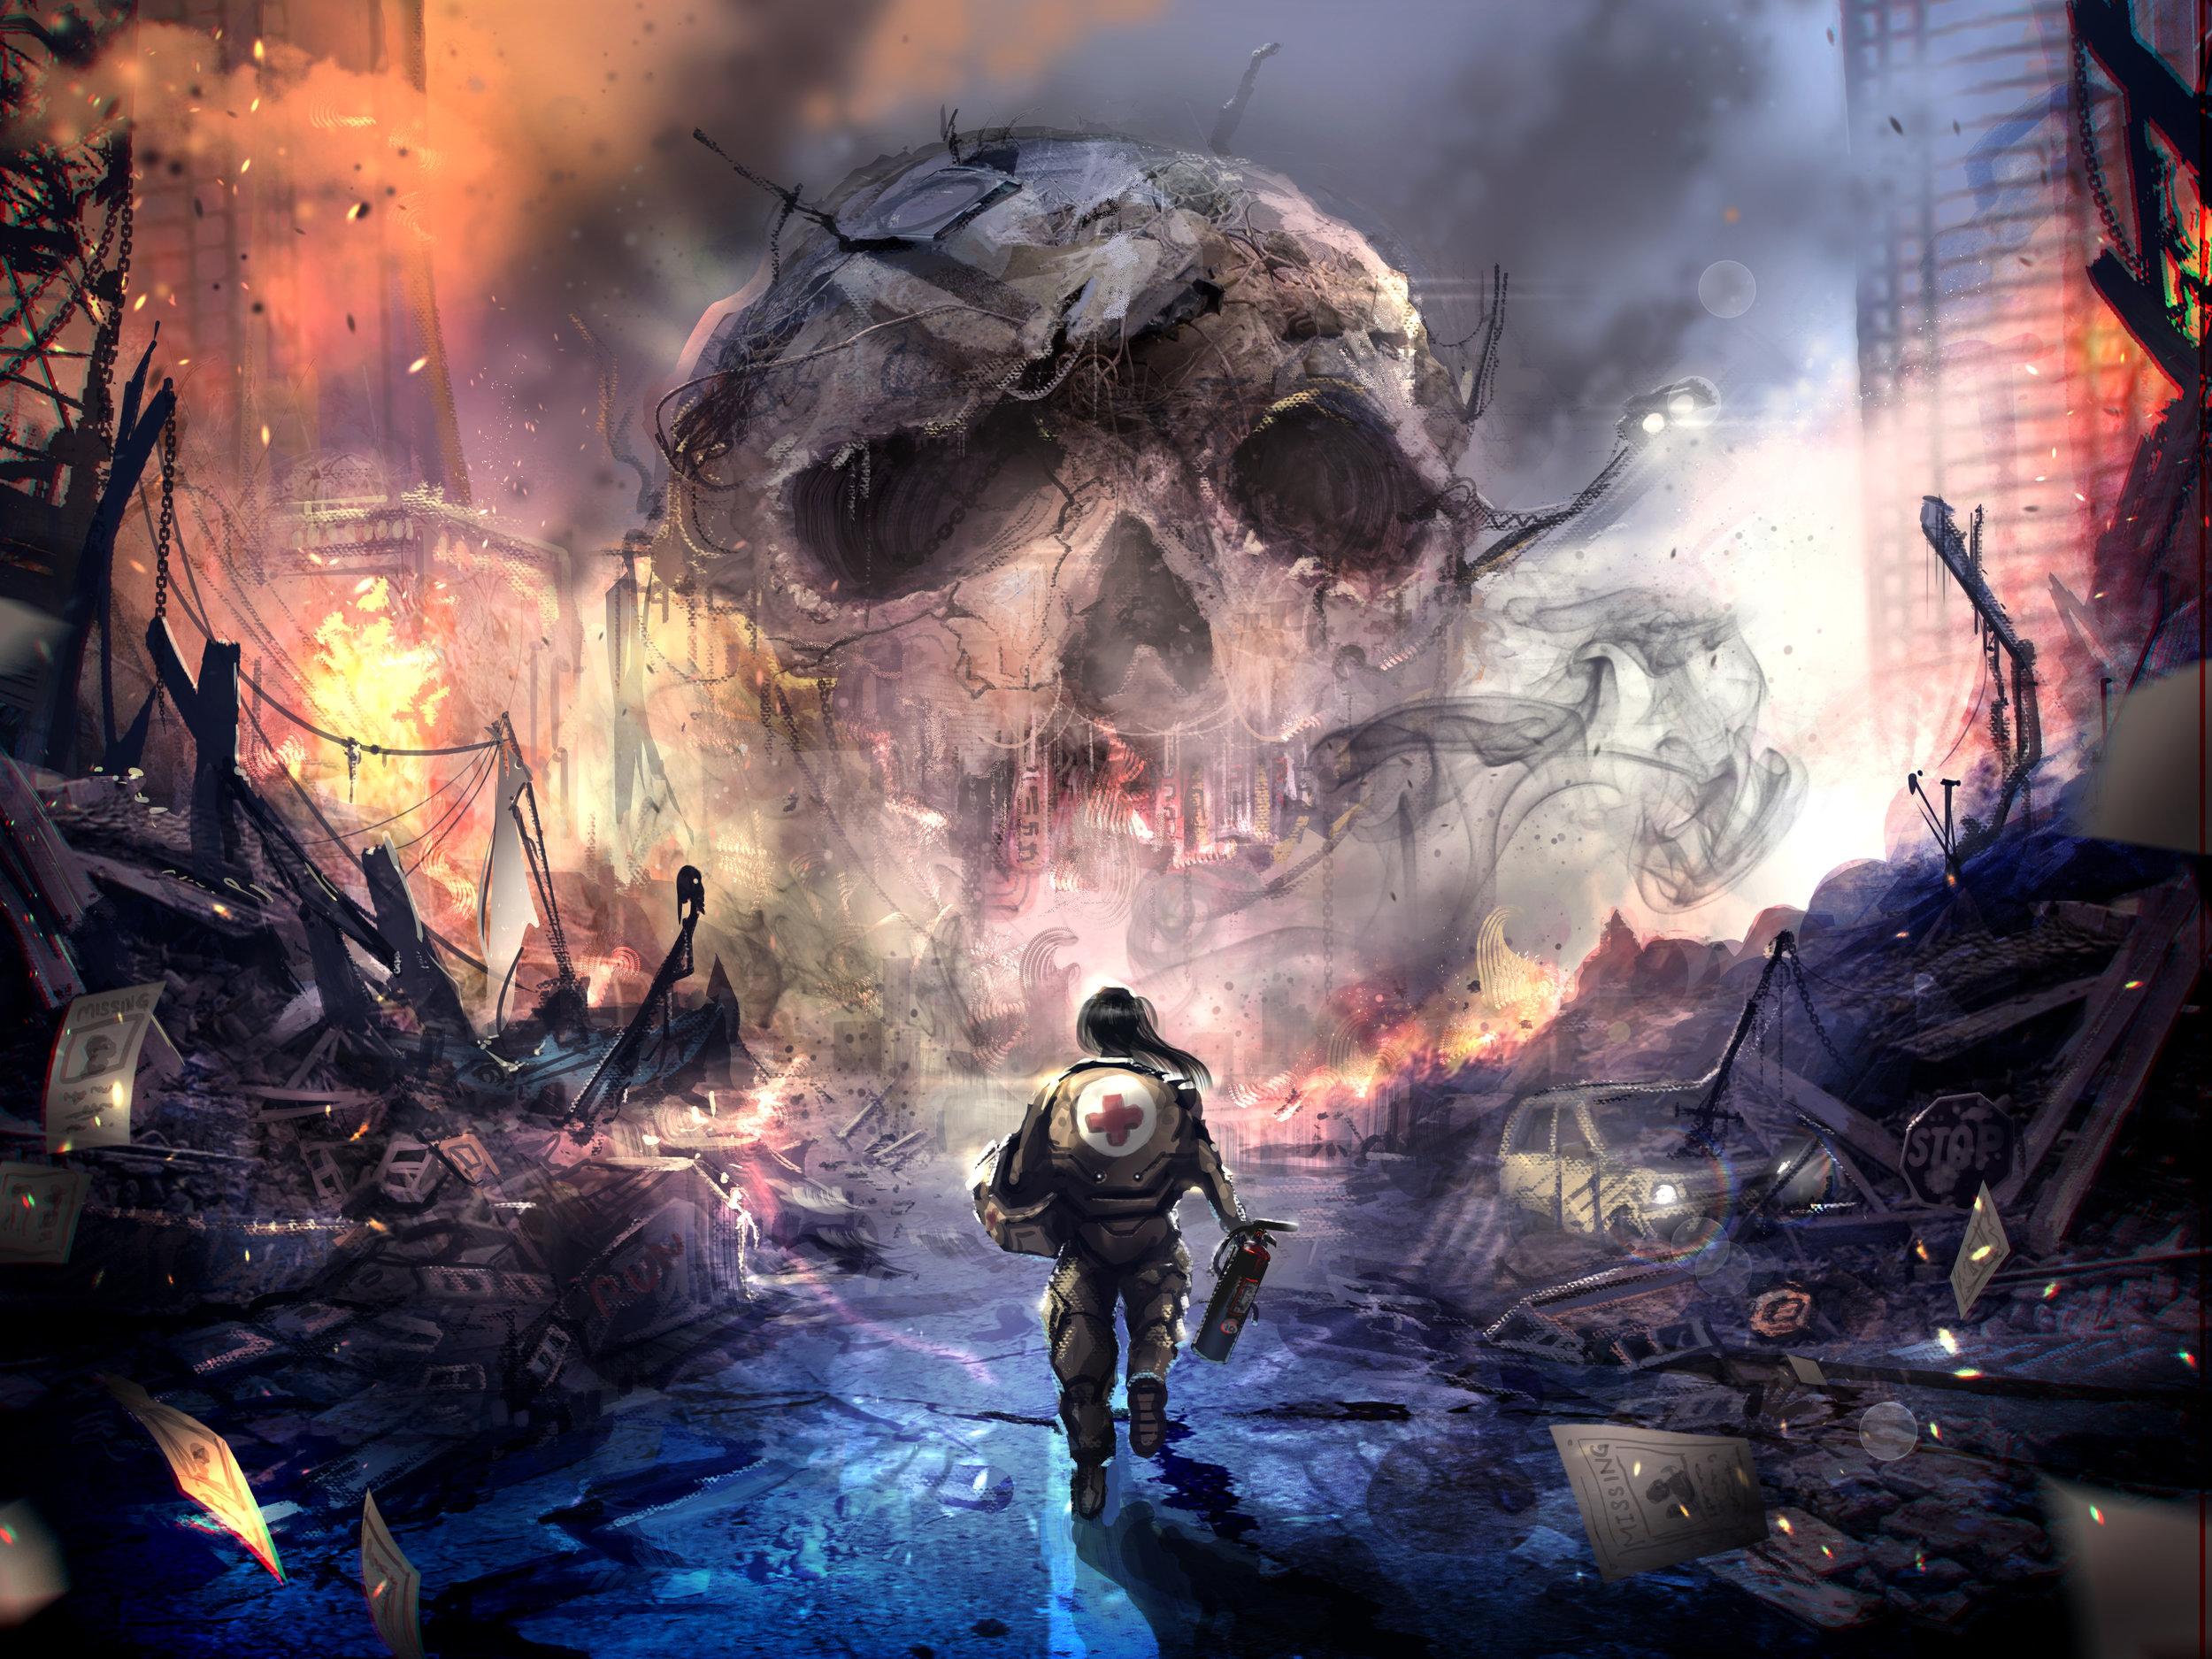 Urban Disaster by  Russell Goh.  https://ultragriffy.deviantart.com/